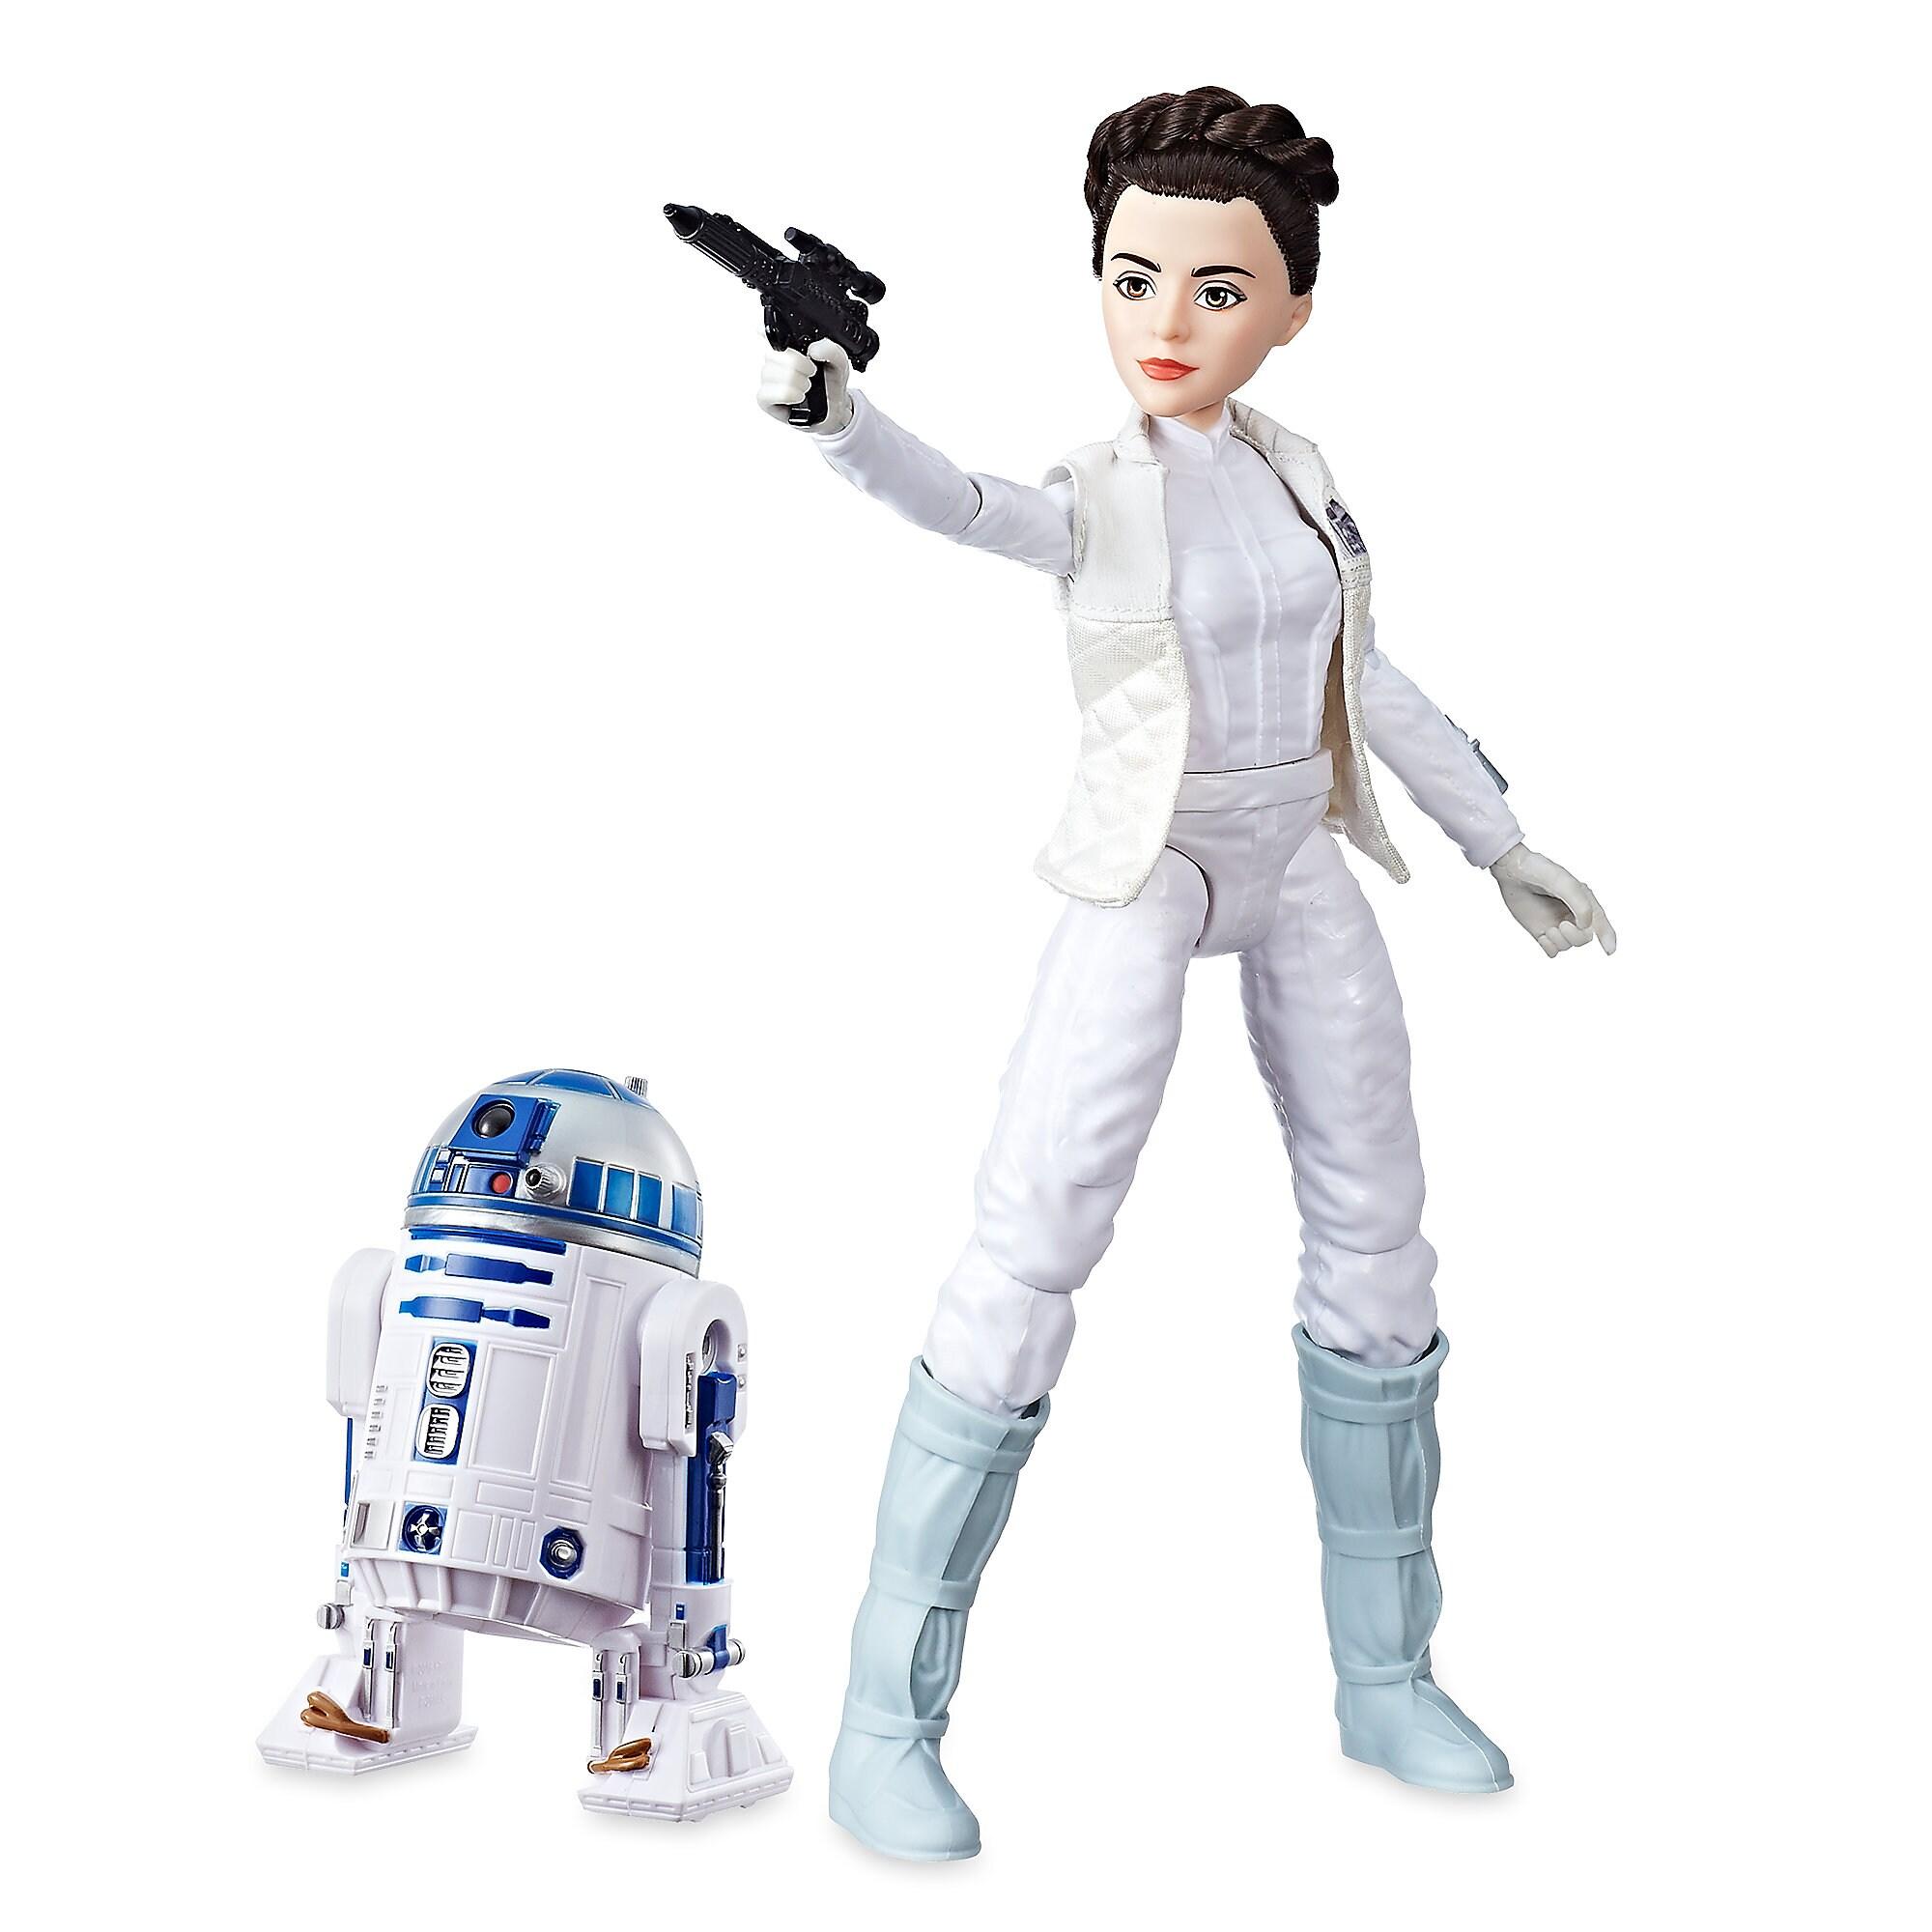 Princess Leia Organa & R2-D2 Action Figure Set - Star Wars: Forces of Destiny